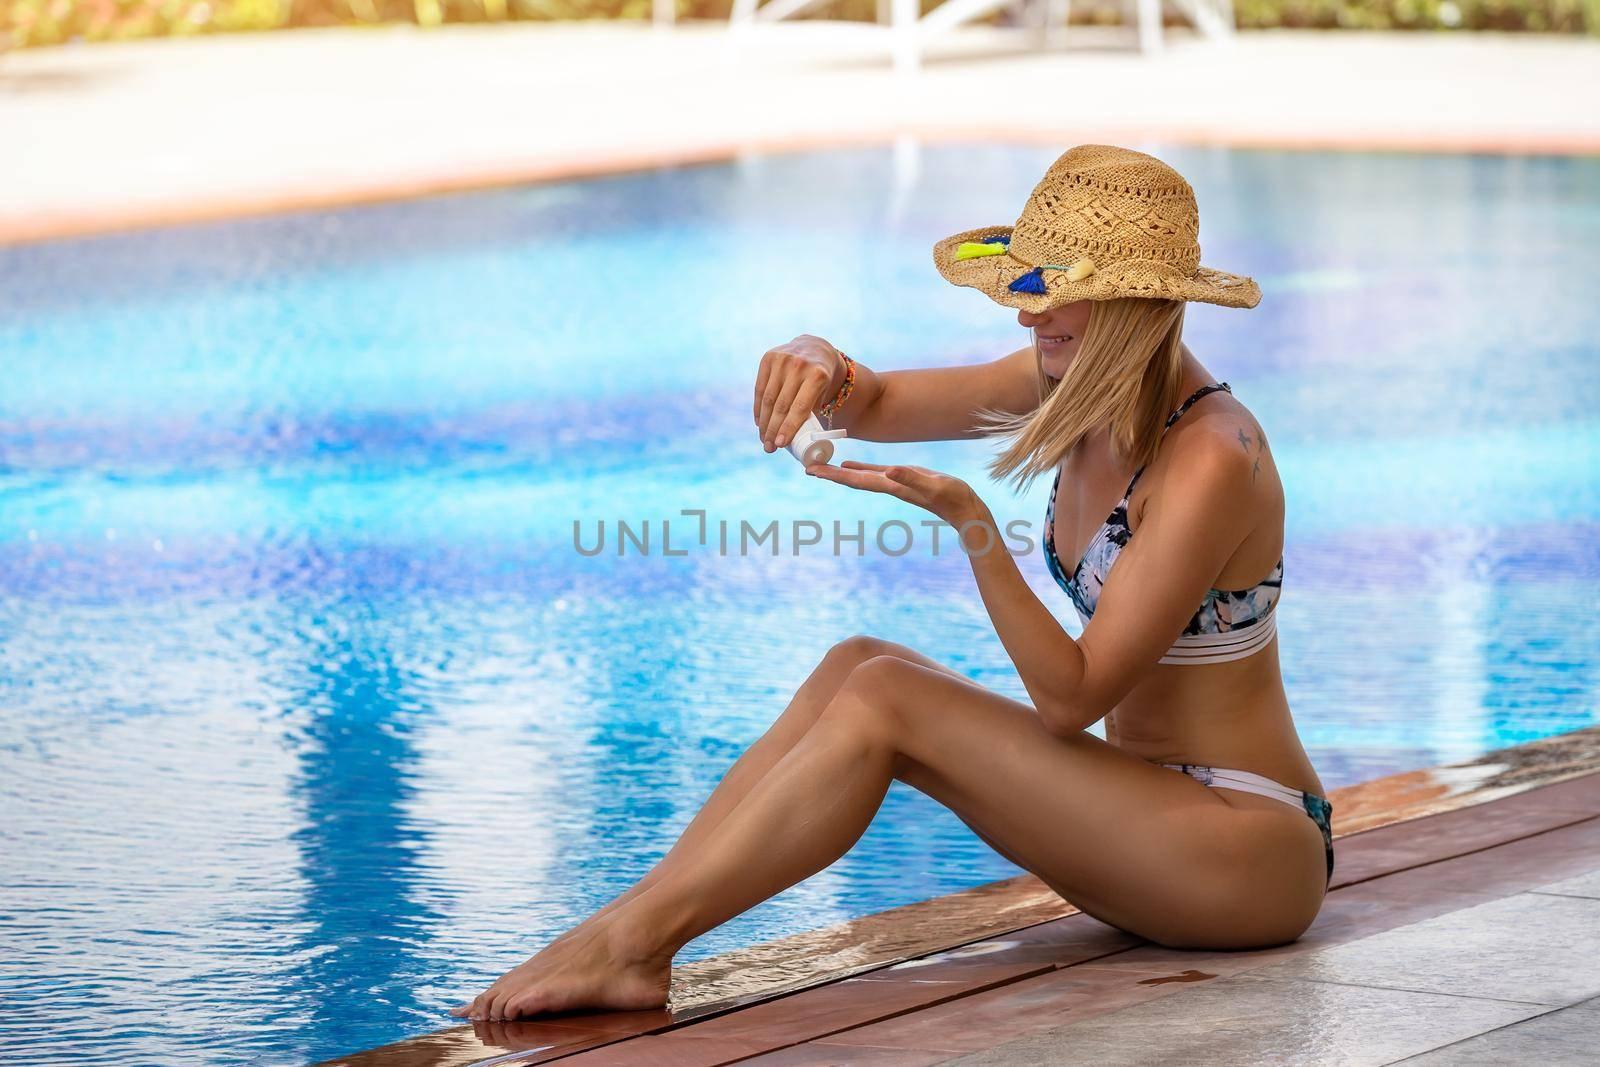 Beautiful Woman Applying Sunscreen. Using SPF Sun Block Lotion. Skin Care from UV Sun Rays. Happy Summer Vacation on the Beach Resort.